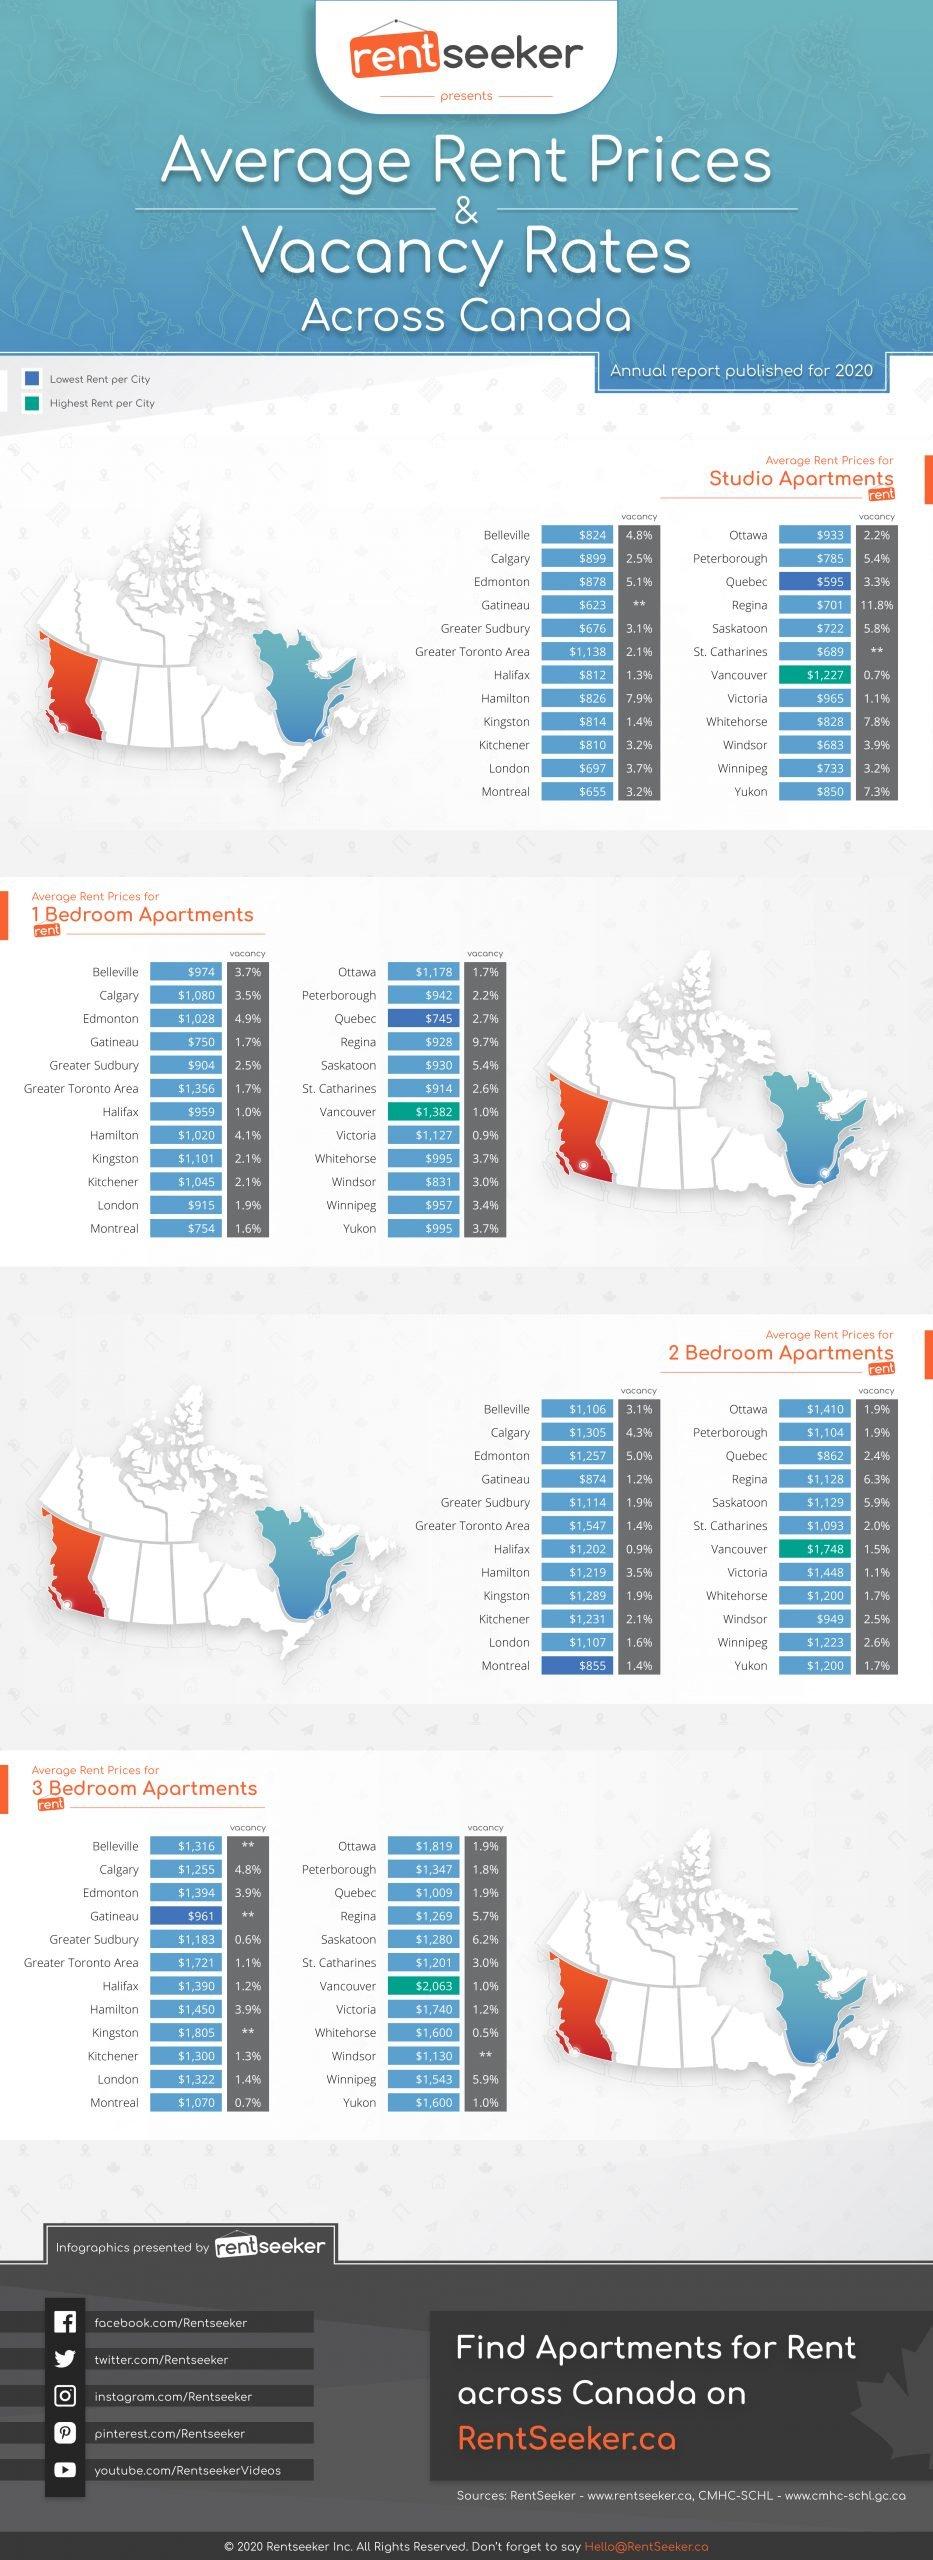 Infographic of Average Rent Prices Across Canada